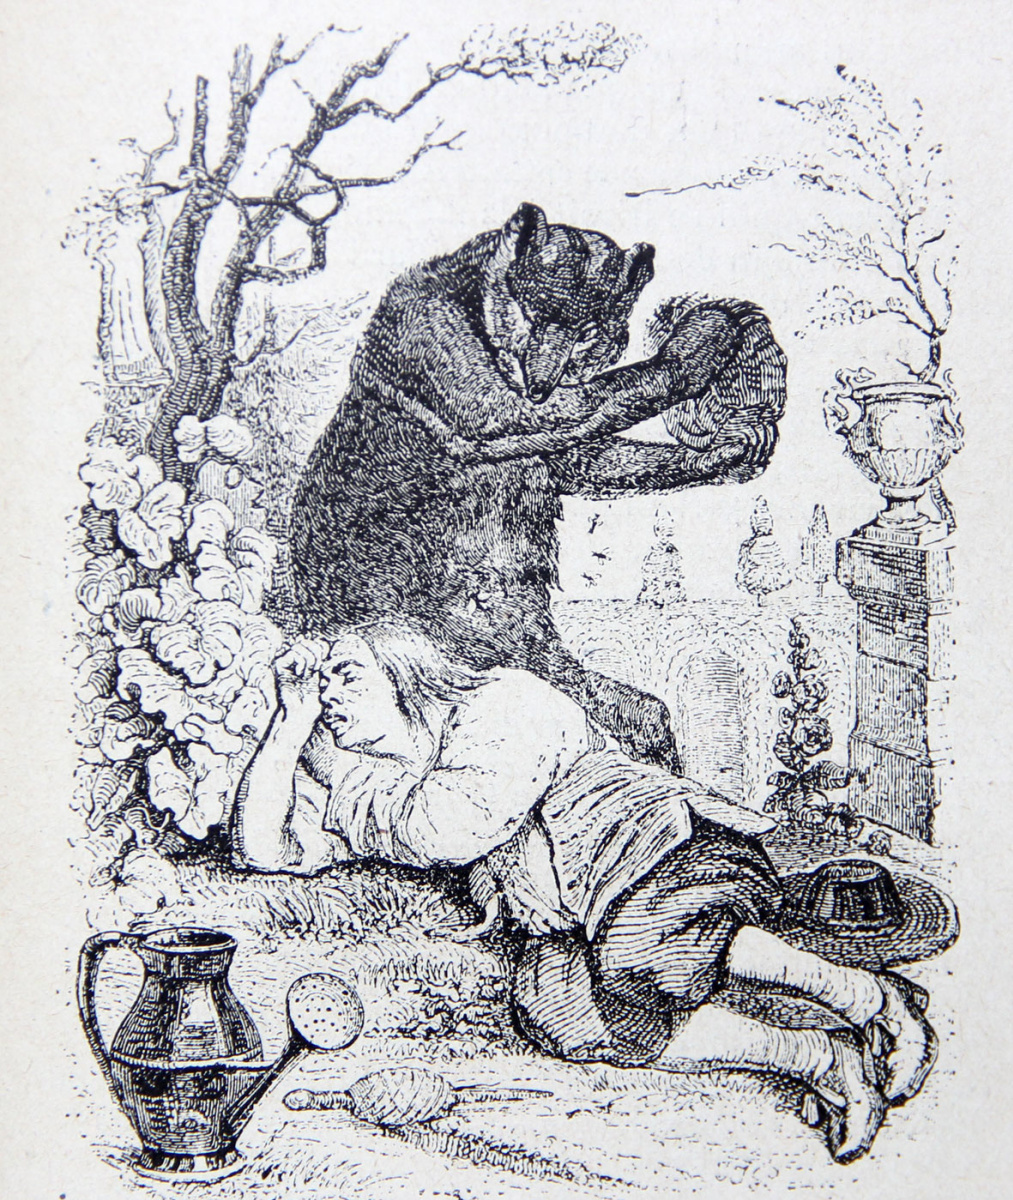 Жан Иньяс Изидор (Жерар) Гранвиль. Медведь и Садовник. Иллюстрации к басням Жана де Лафонтена